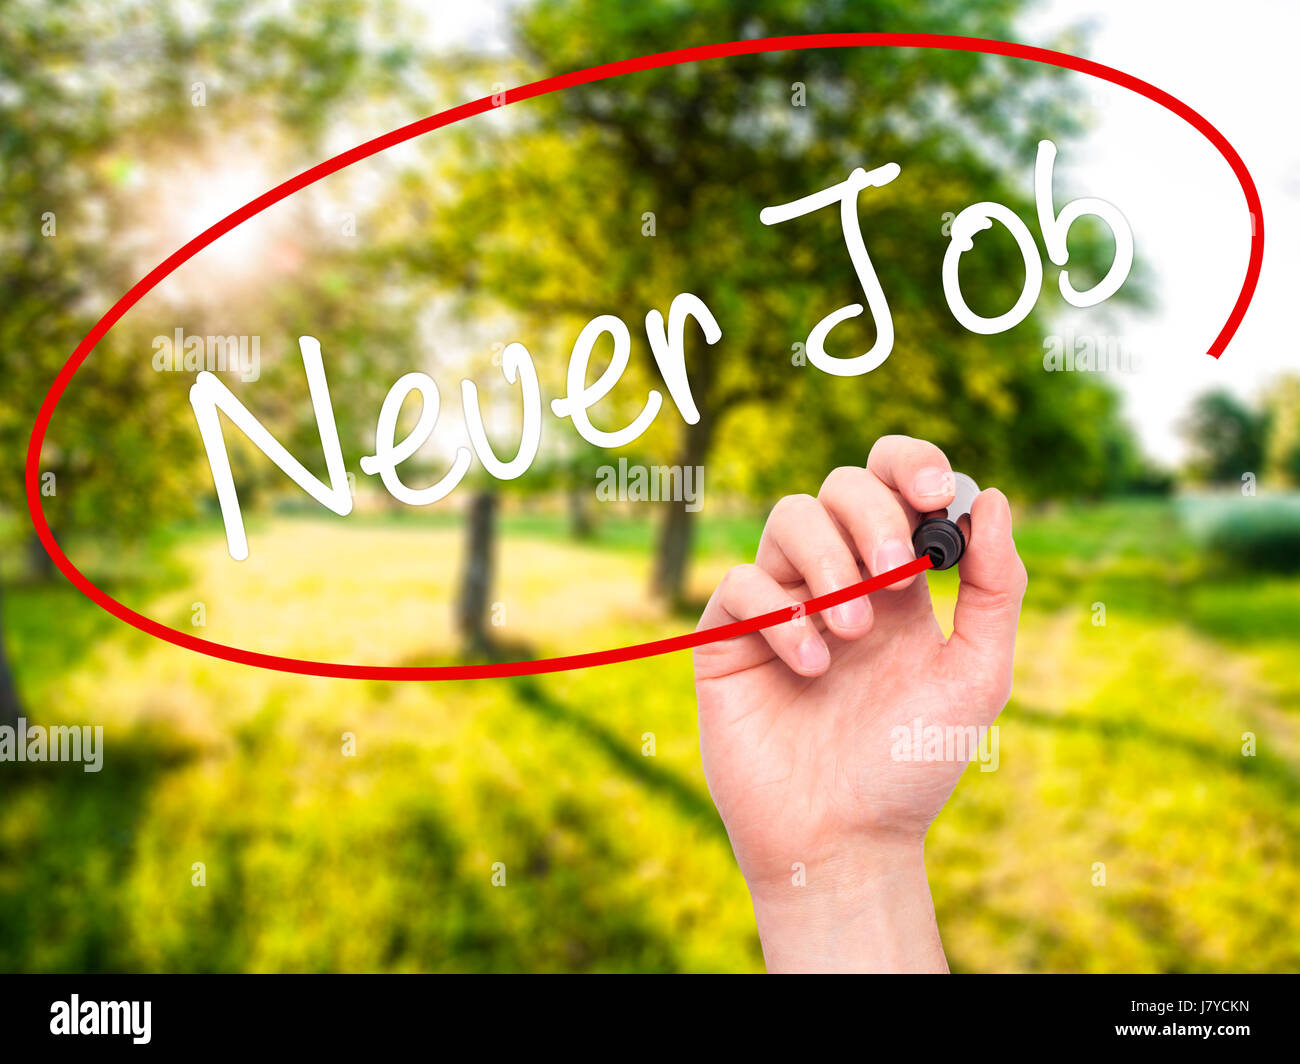 Neuer Job Imágenes De Stock Neuer Job Fotos De Stock Alamy